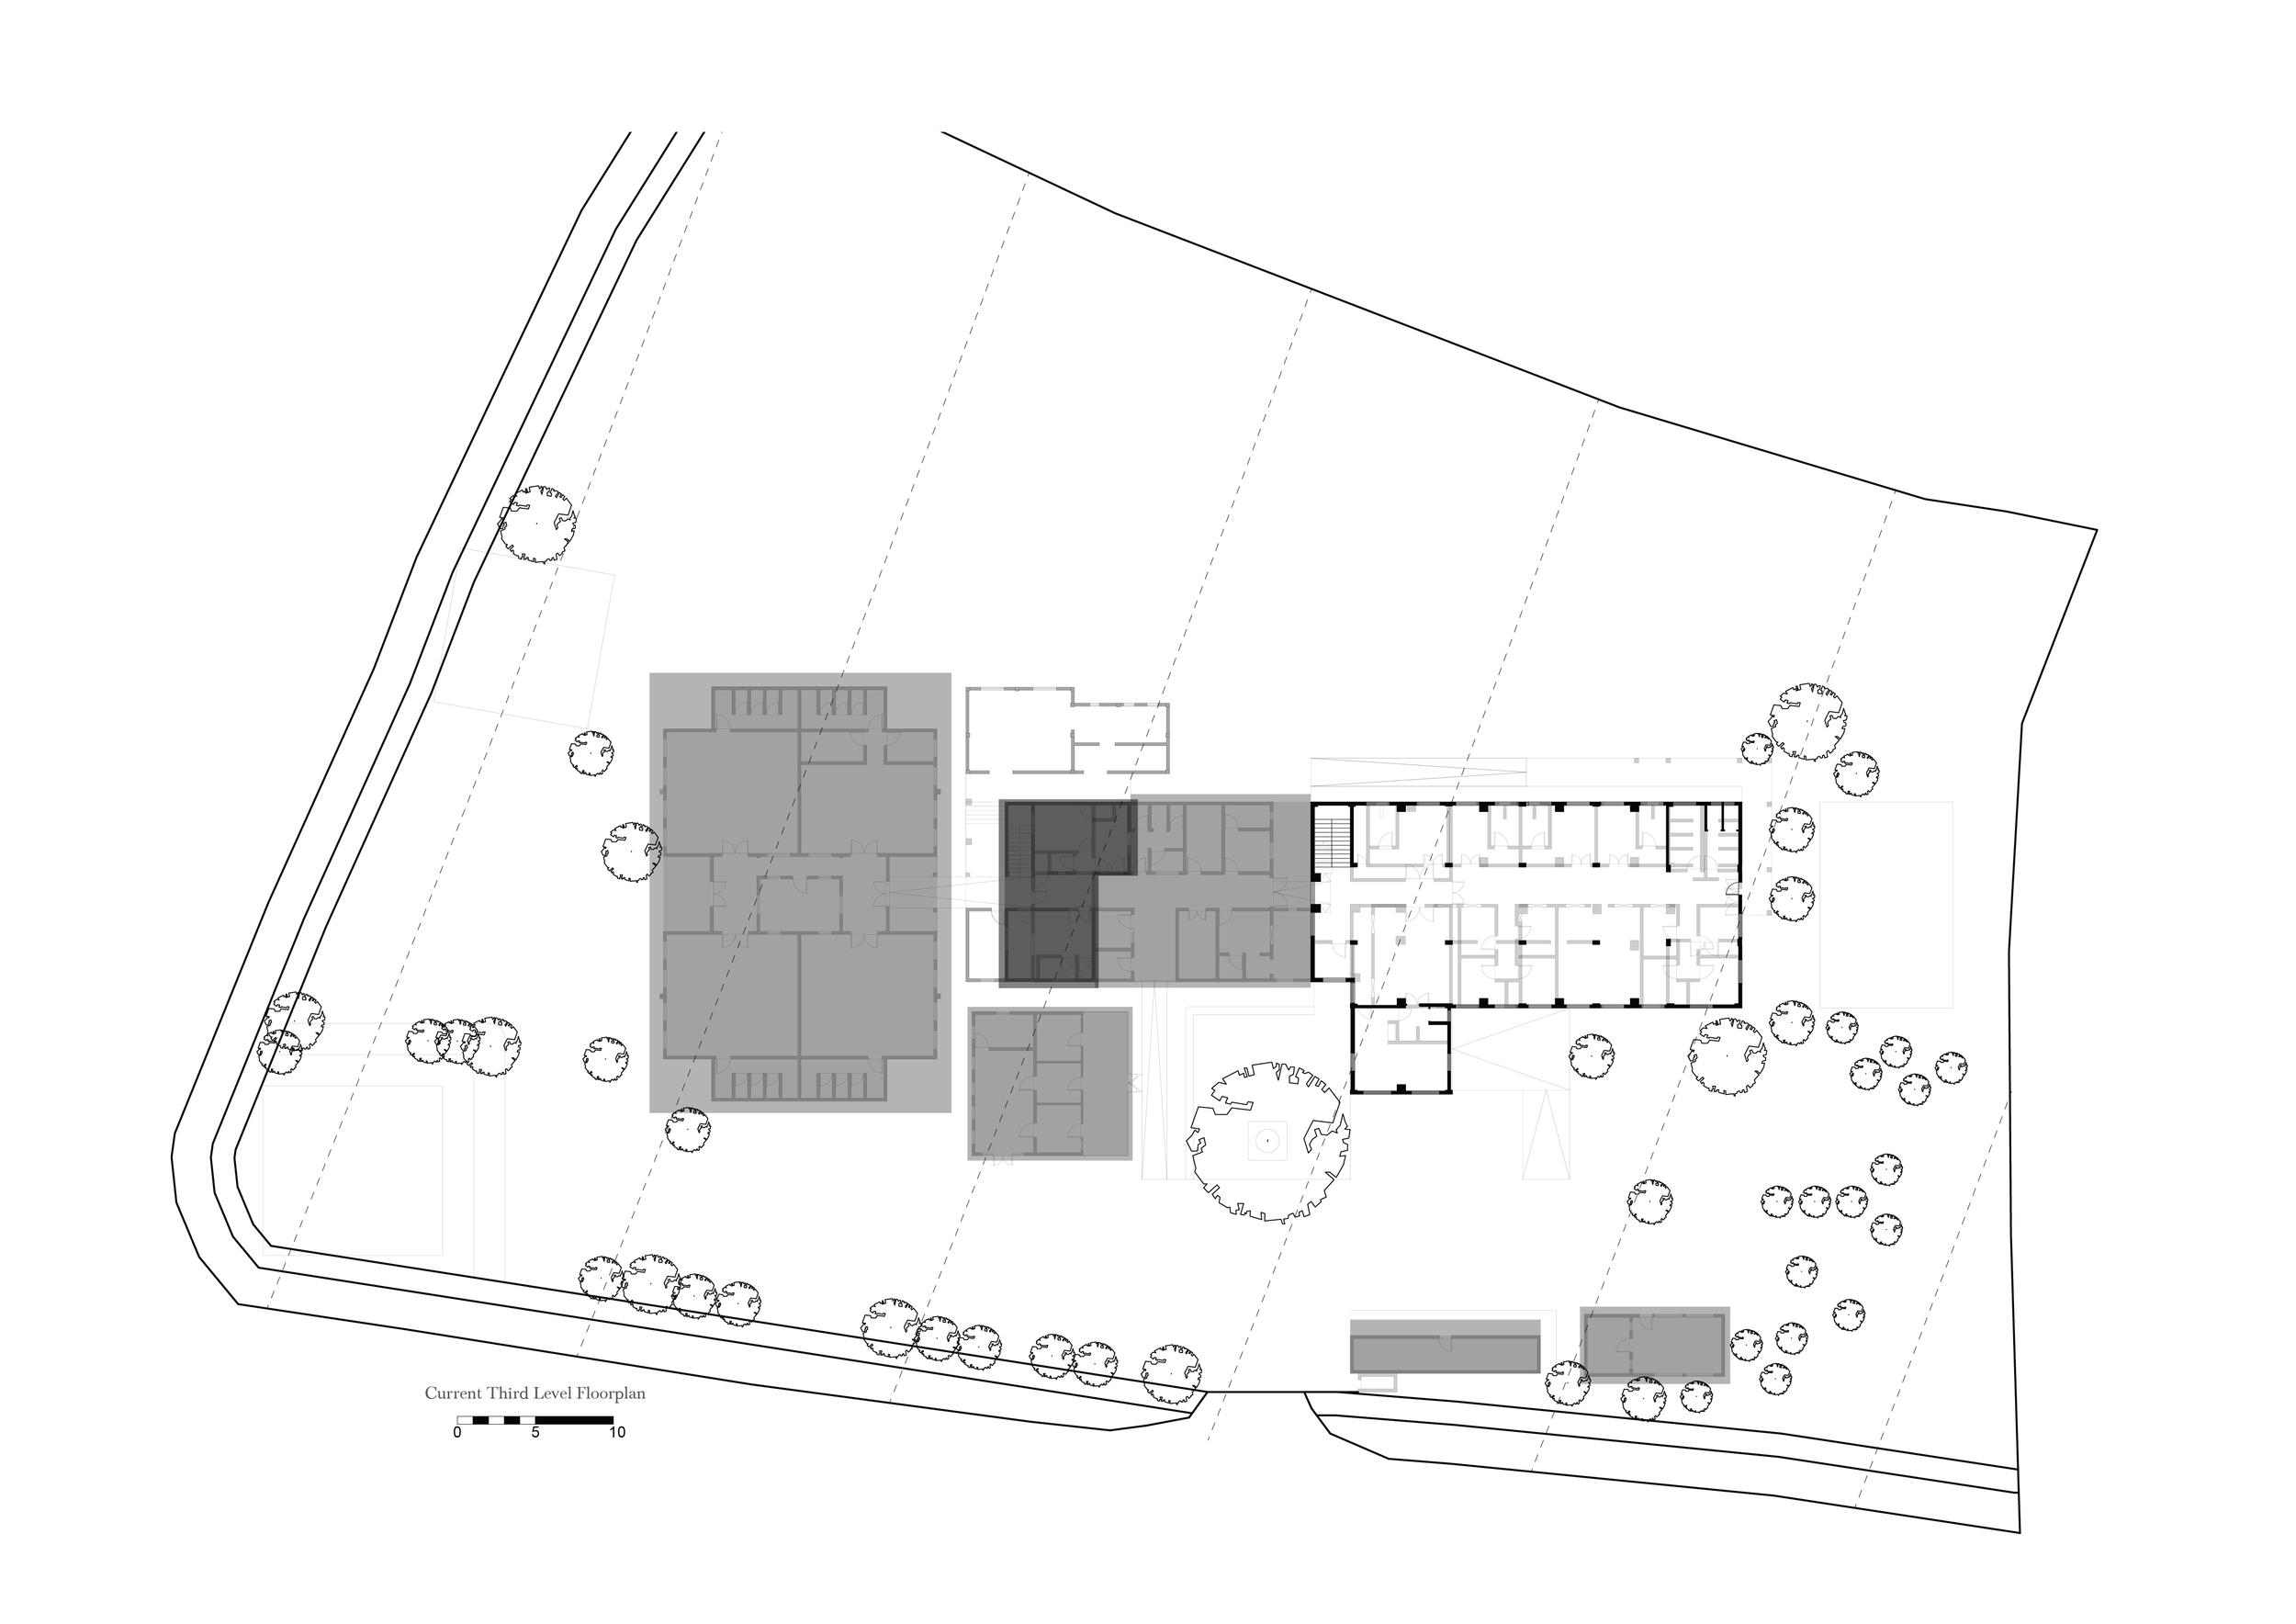 03_SagamHospital_Masterplan-03.jpg